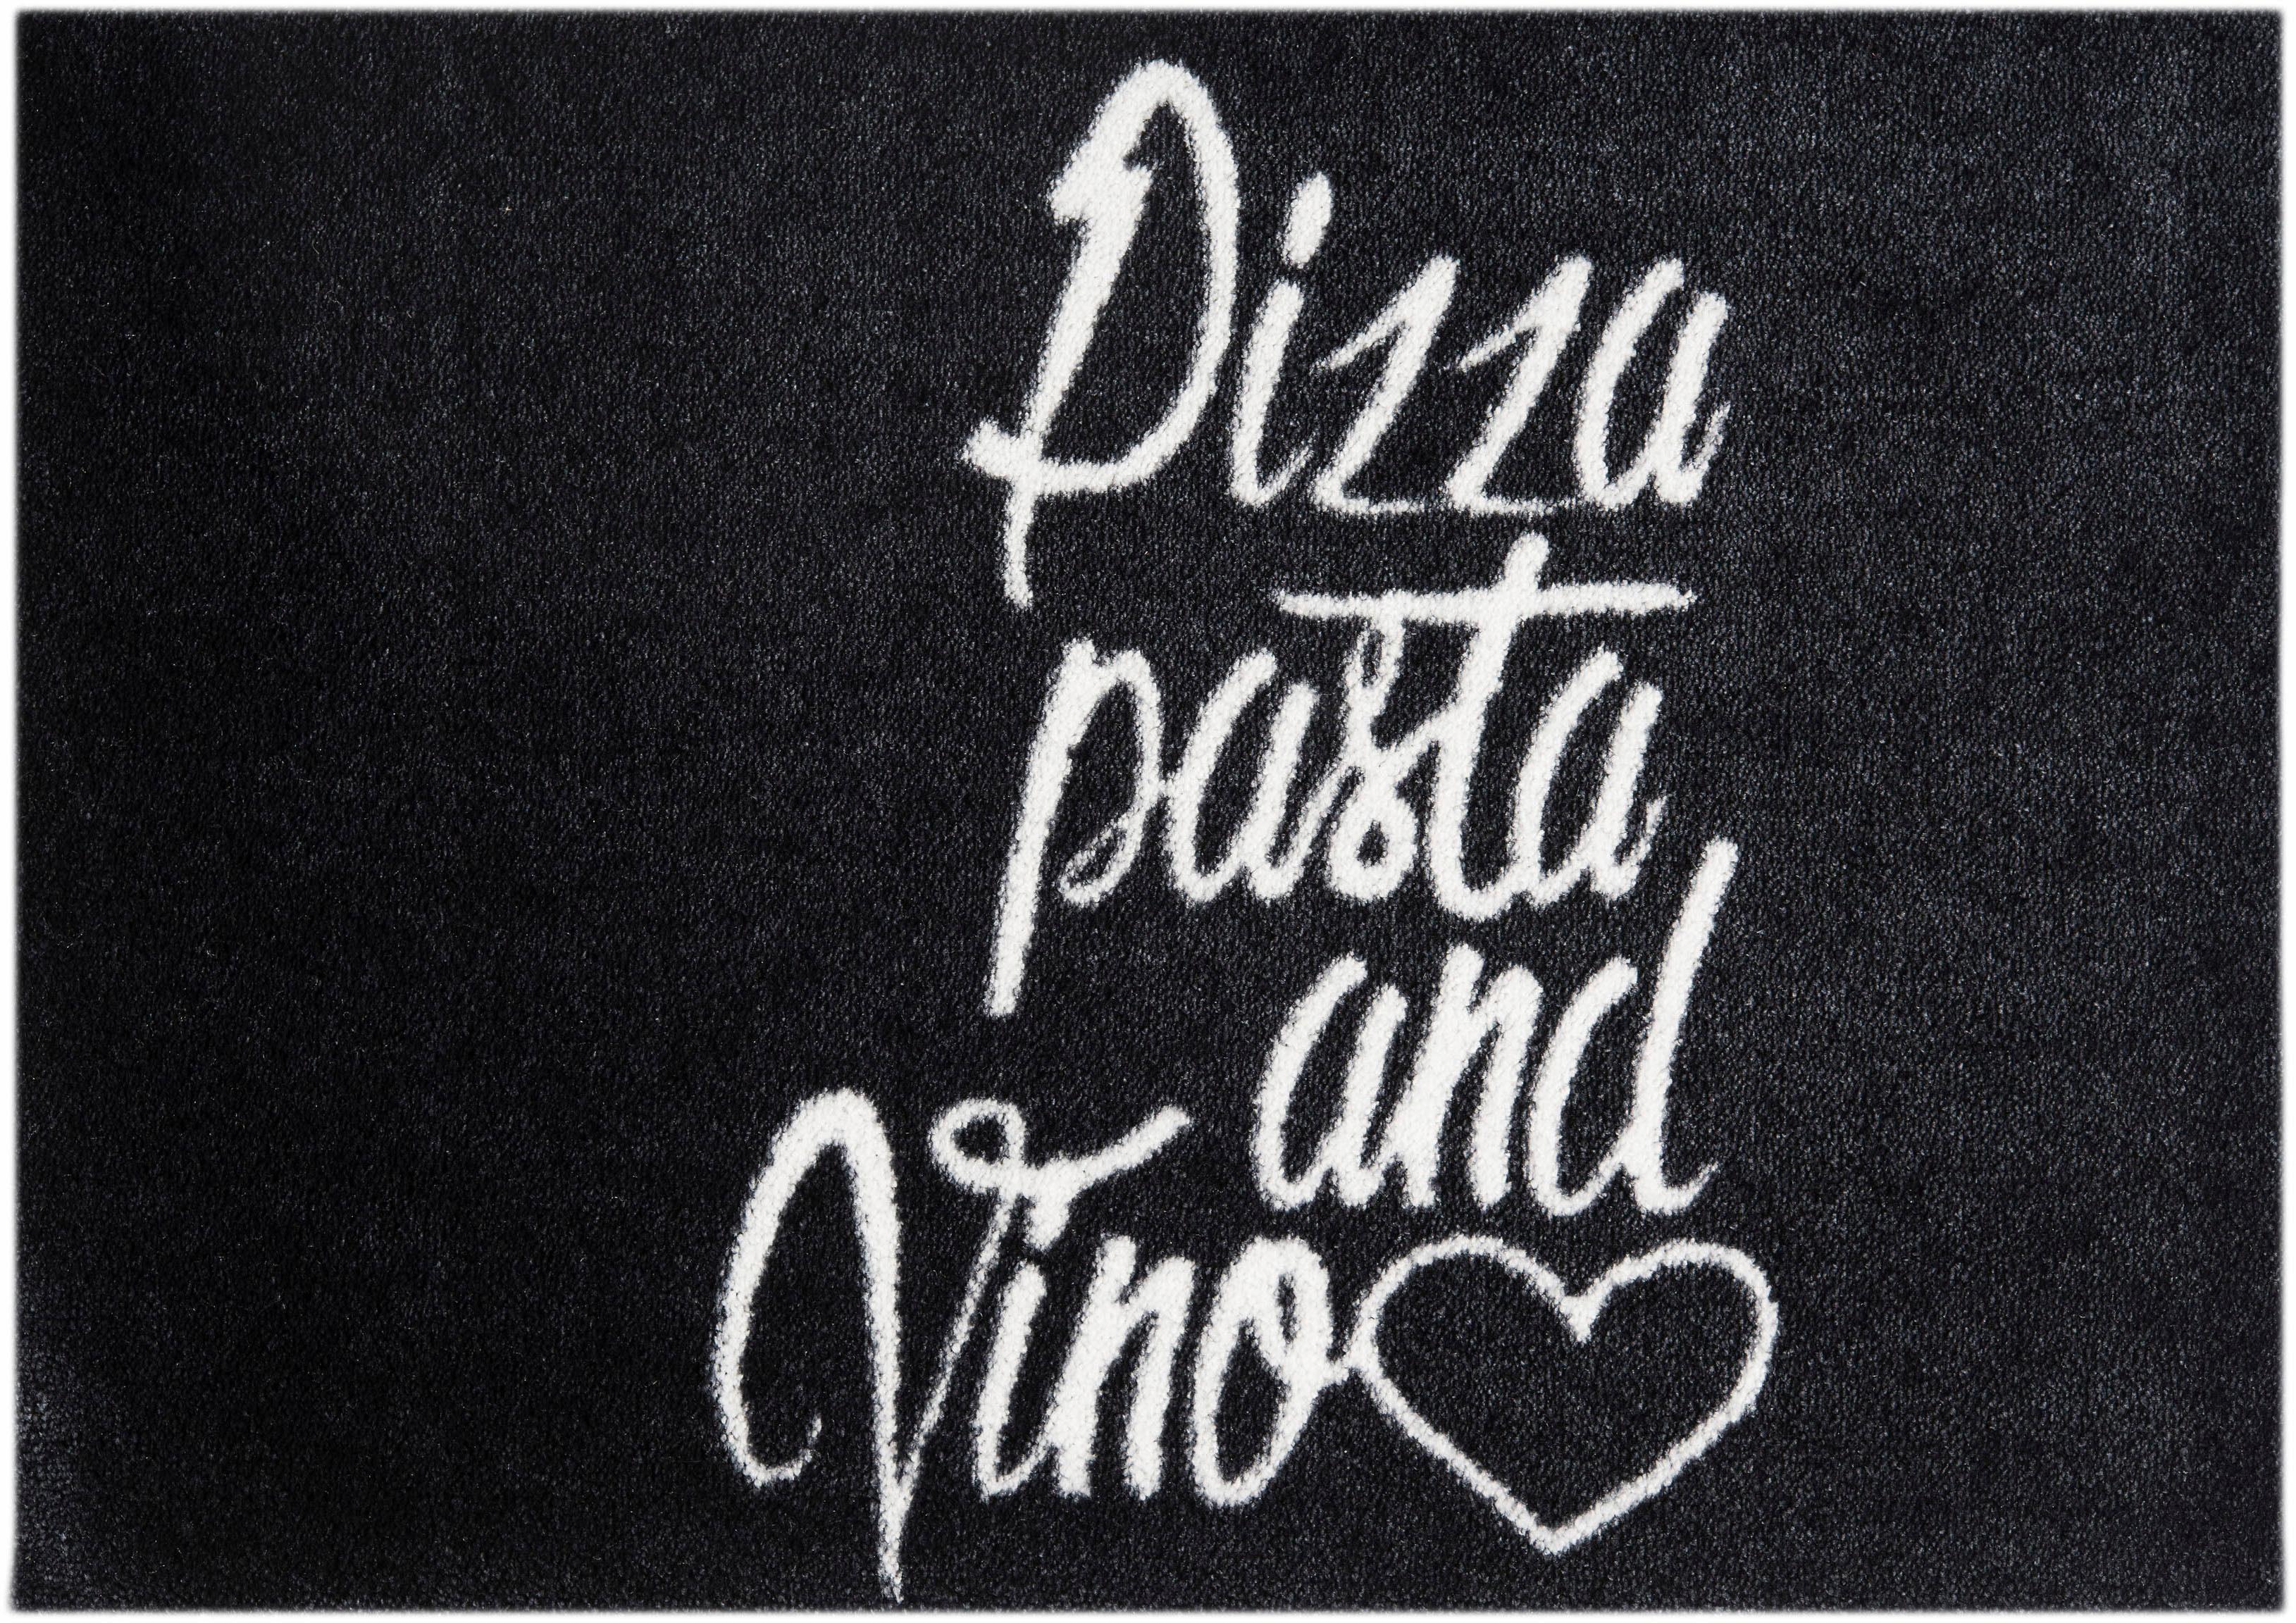 Teppich »Pizza Vino Love«, MINT RUGS, rechteckig, Höhe 7 mm, waschbar